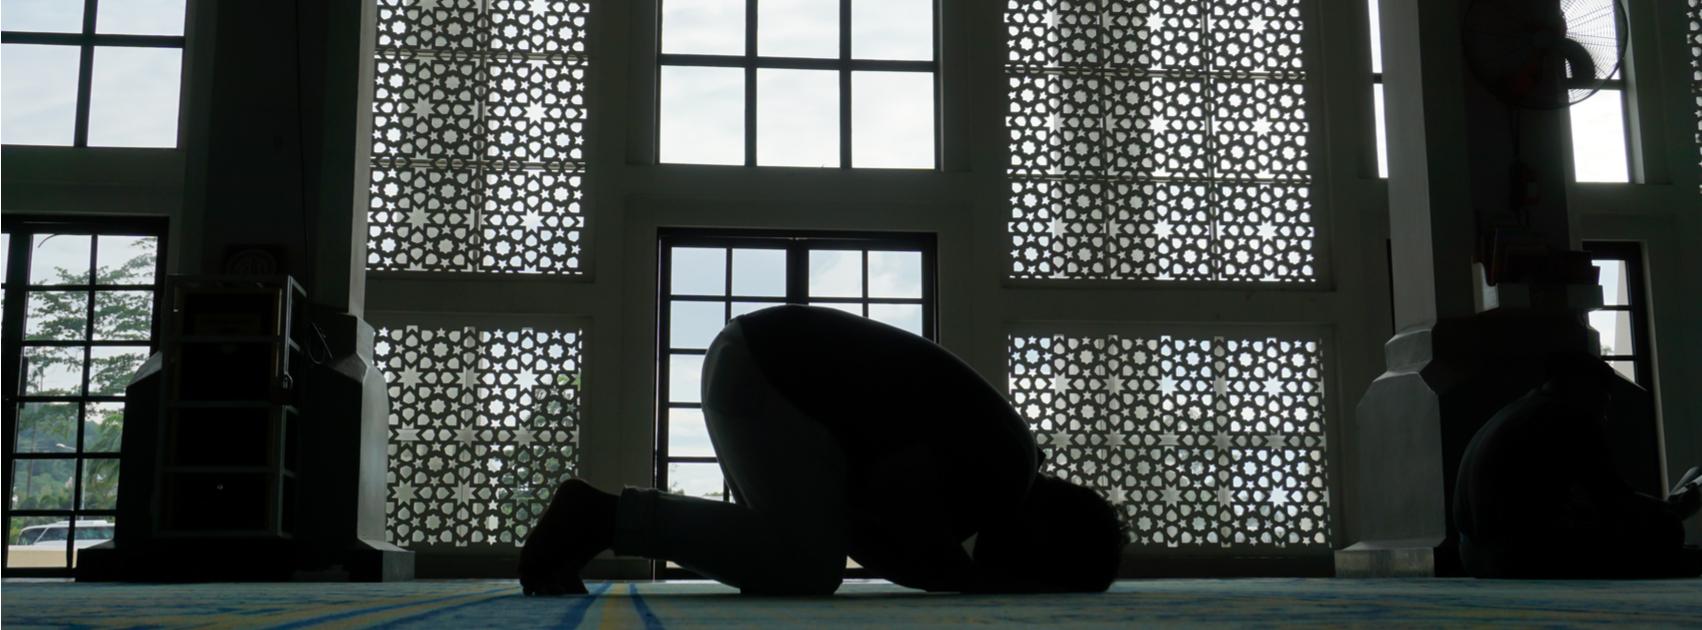 toil of prayer shia